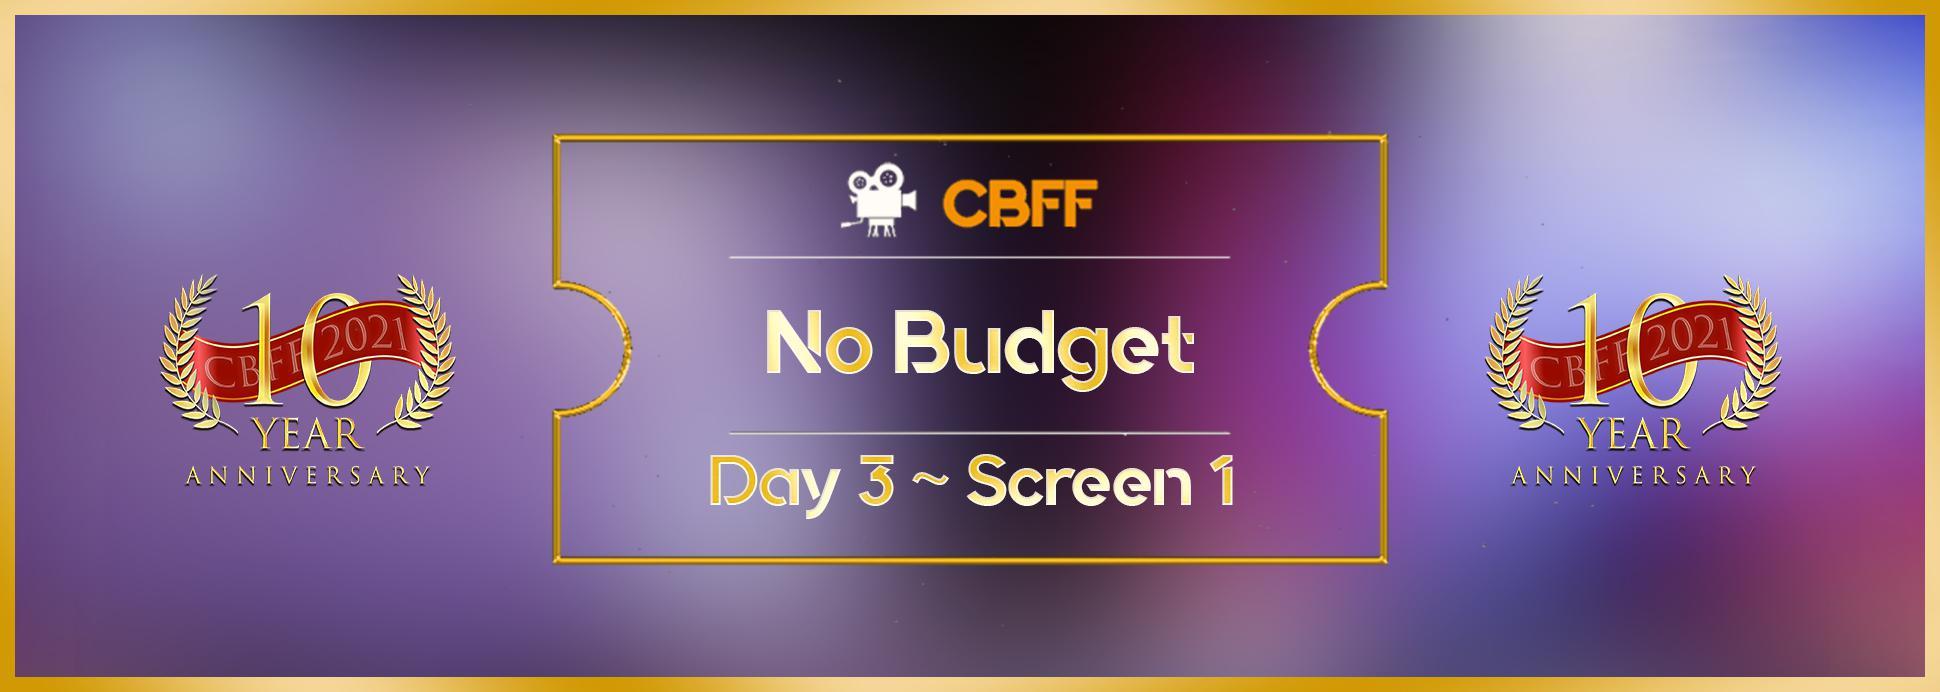 Day 3, Screen 1: No Budget Short 2